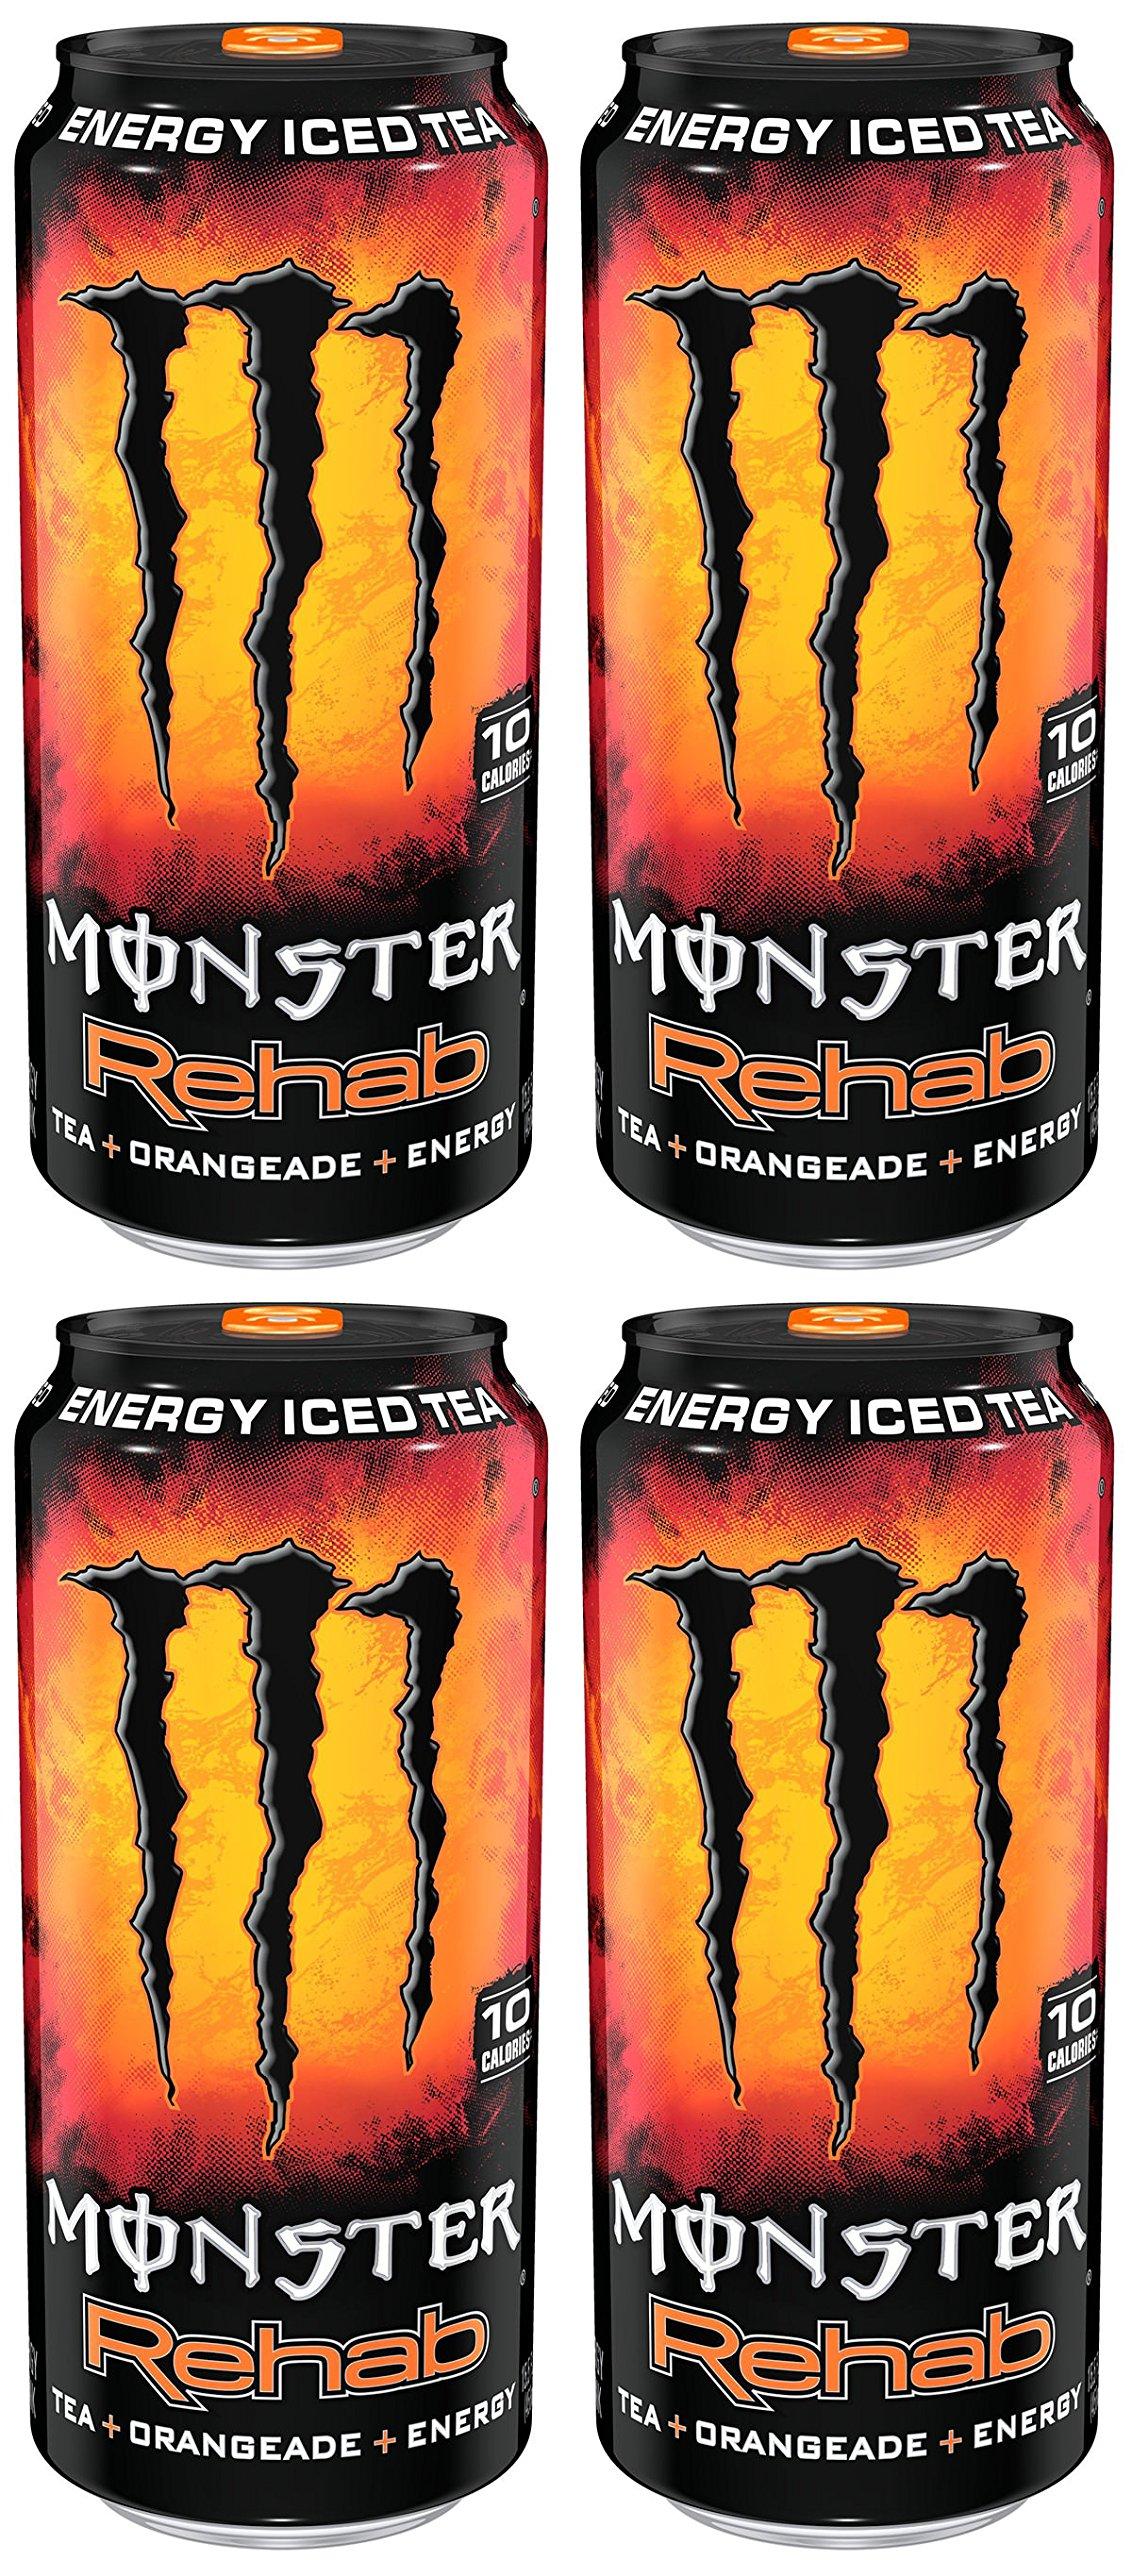 AQSSDQC Monster Rehab, Tea, Orangeade, Energy, 15.5 Ounce, 4 Cases